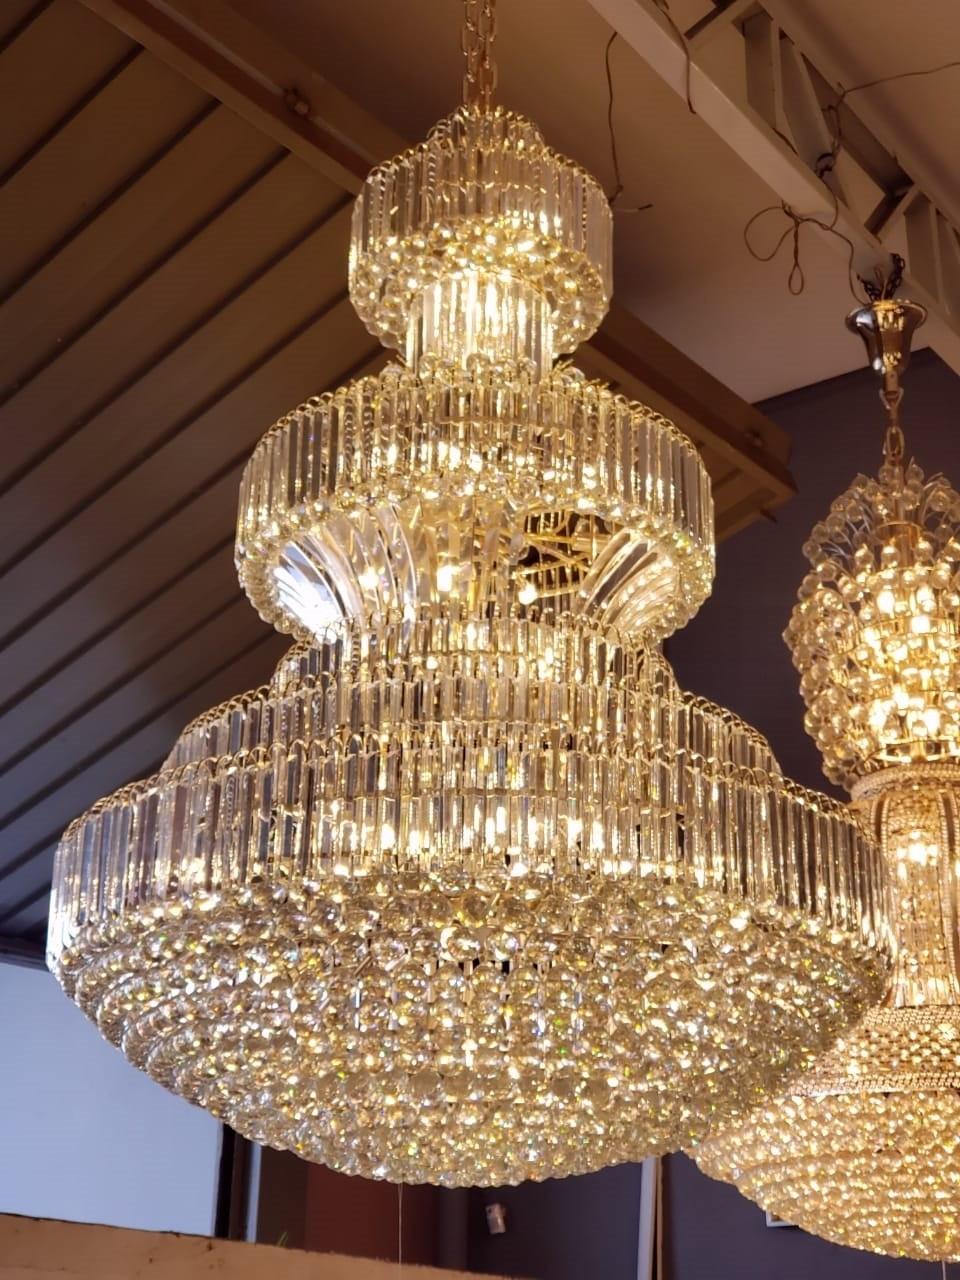 Lustre Imperial de Cristal Transparente e Estrutura Cromada 46 Lâmpadas - Frontier